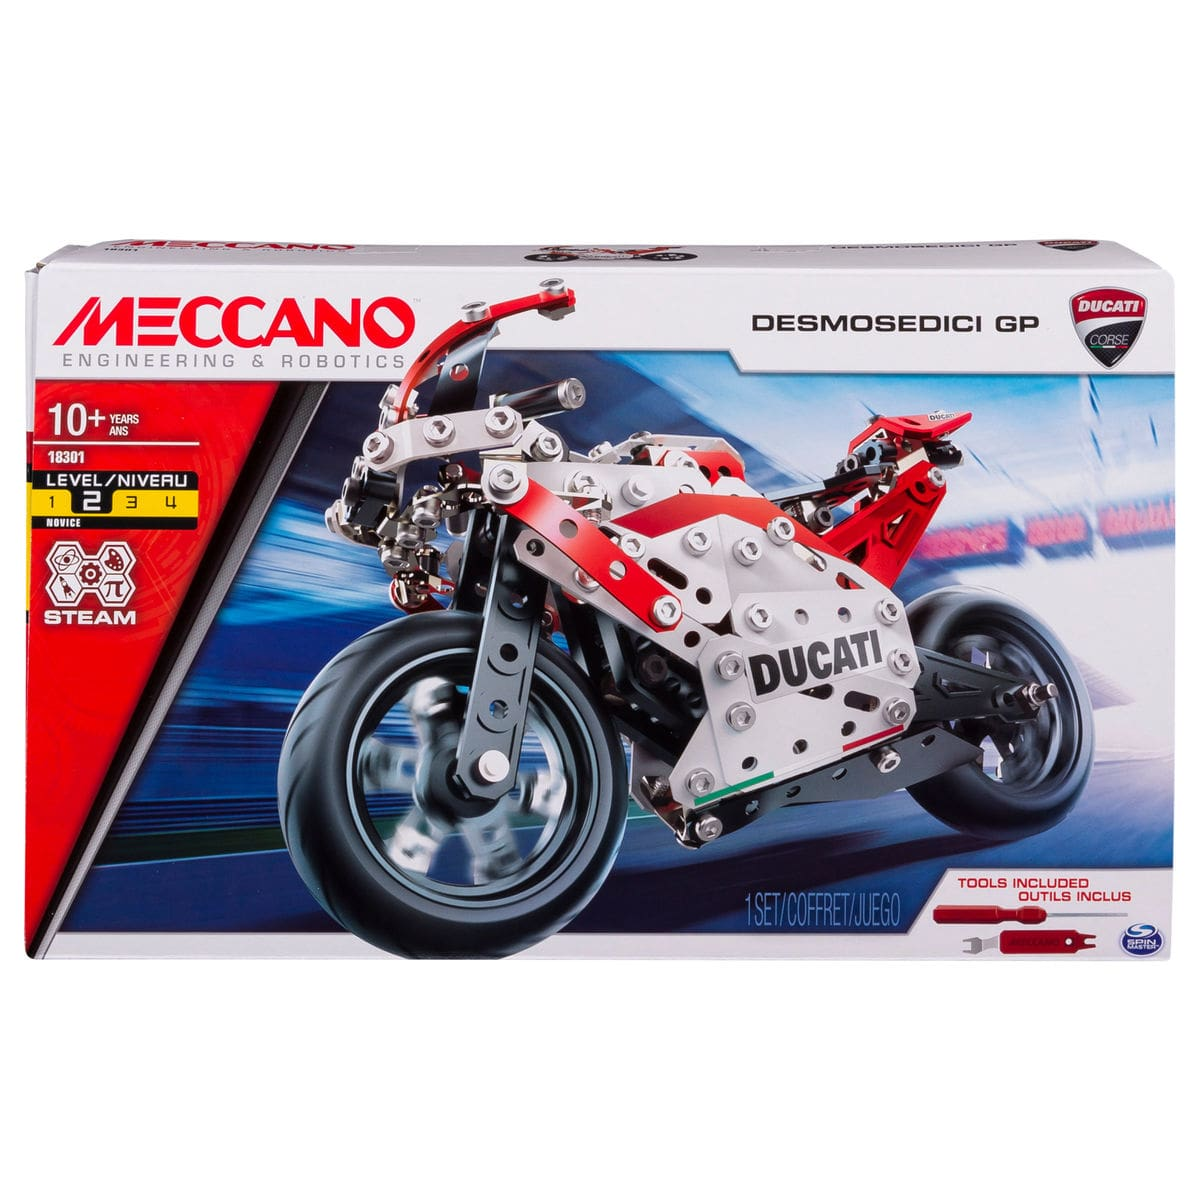 Moto Ducati Gp 16